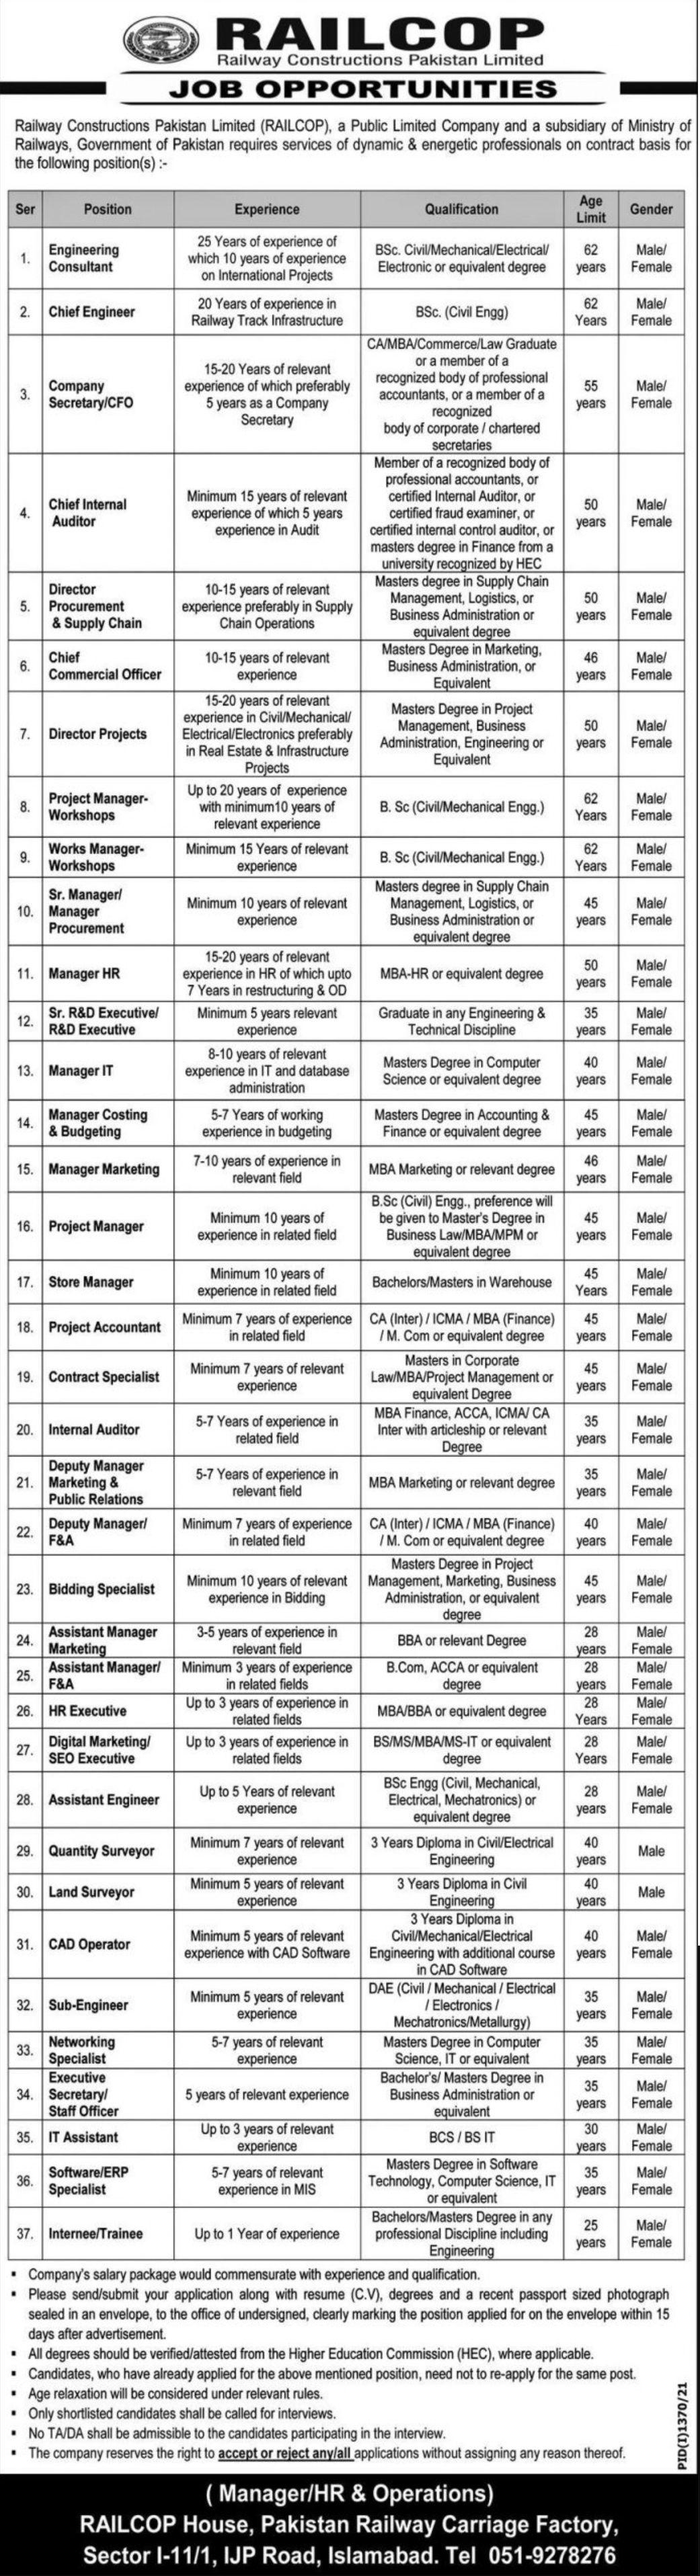 Railway Constructions Pakistan Limited RAILCOP Vacancies 2021 3